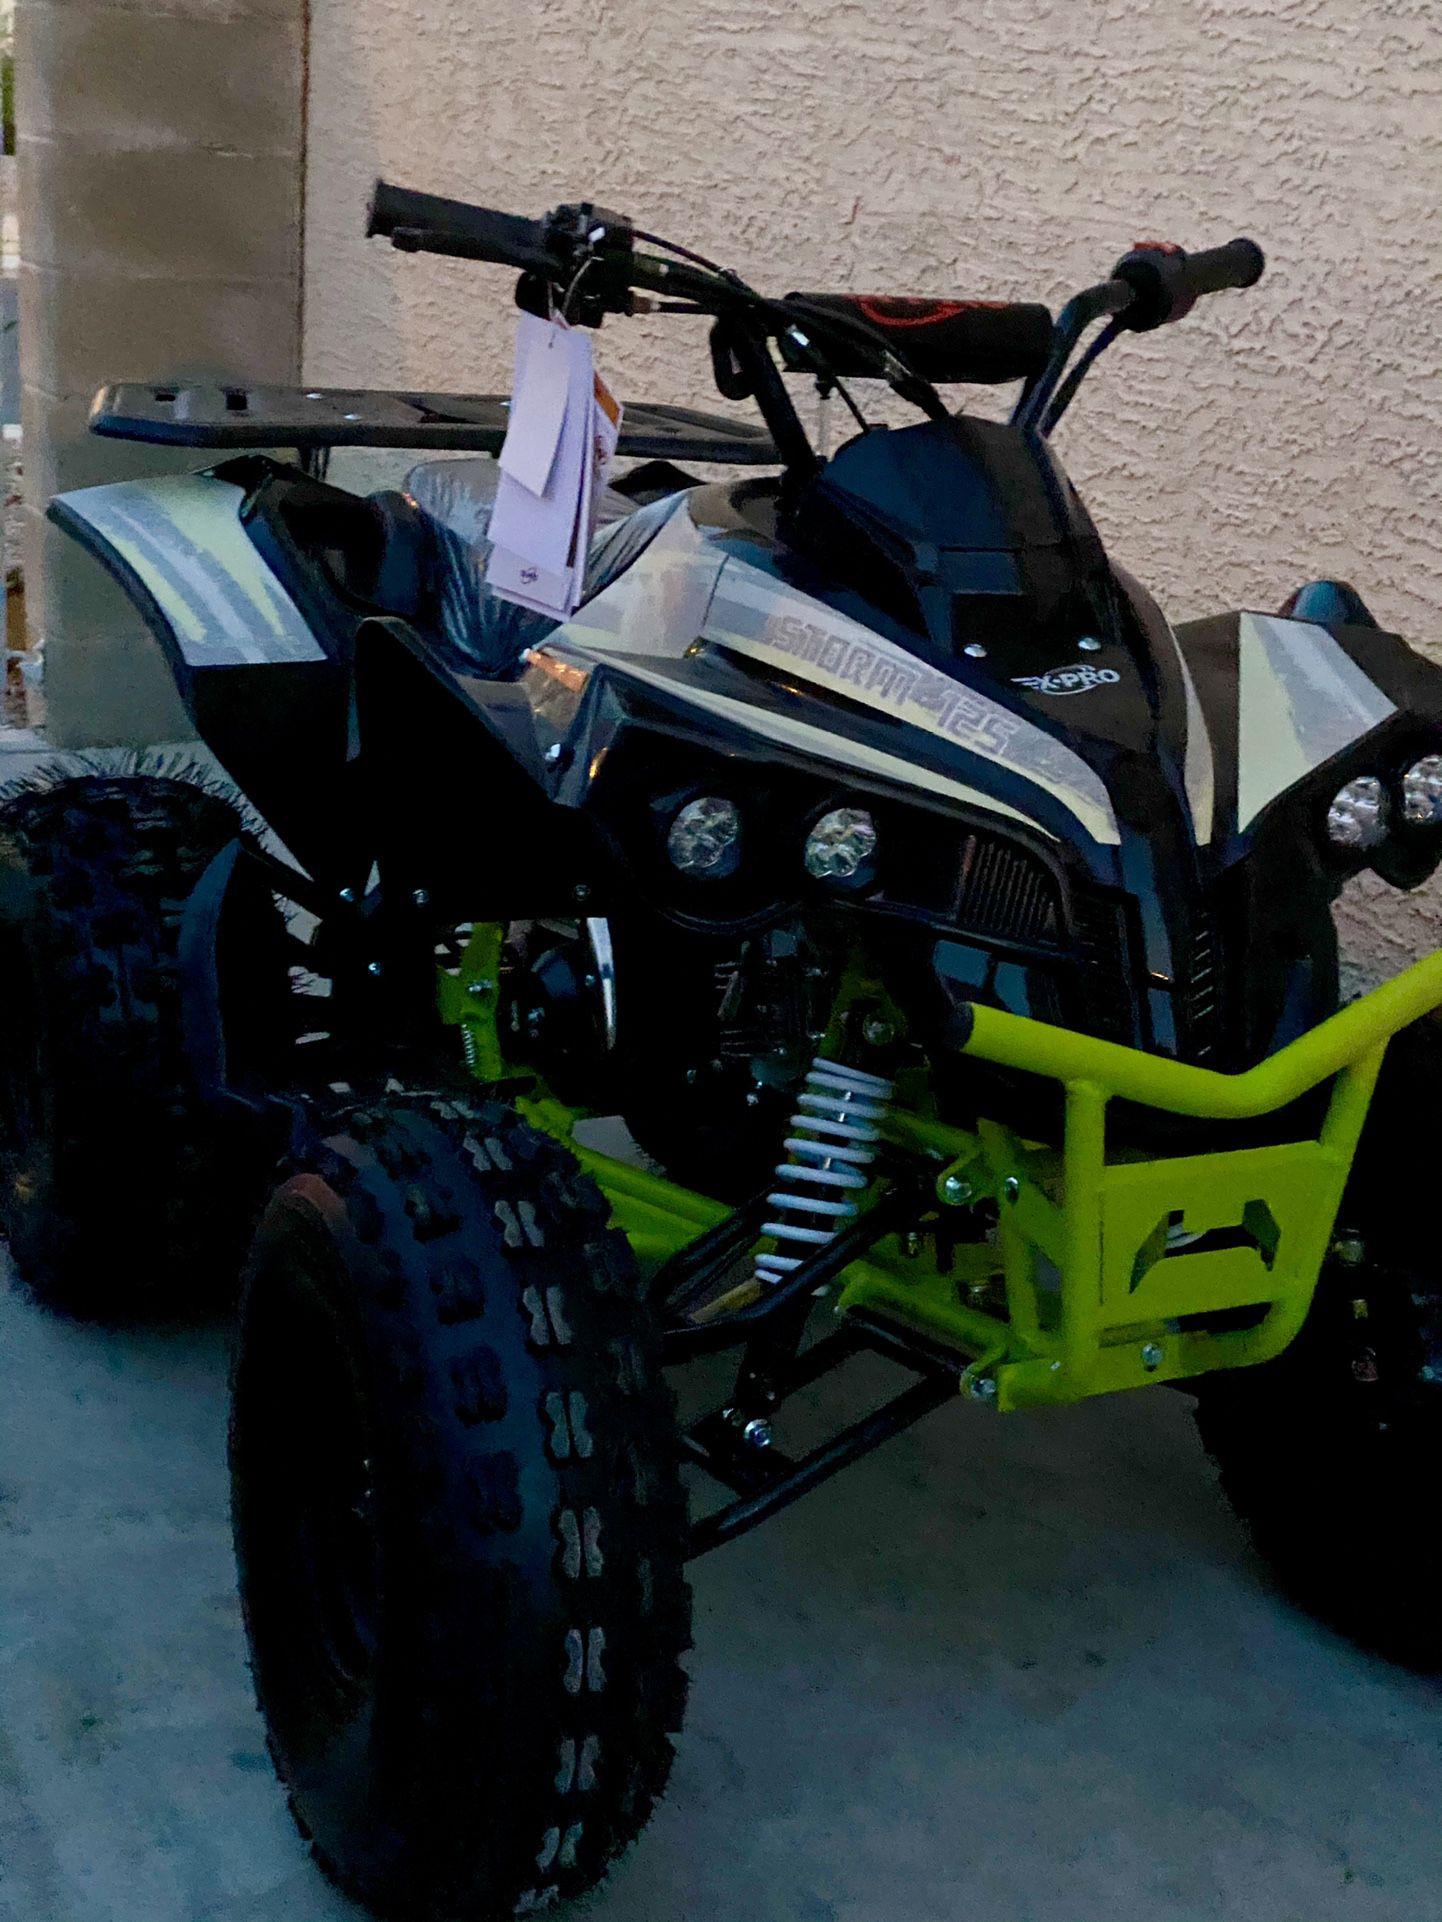 🚨Brand New ATV Quad 4 Wheeler for ADULT 125cc w/ LED lights & Title on Hand